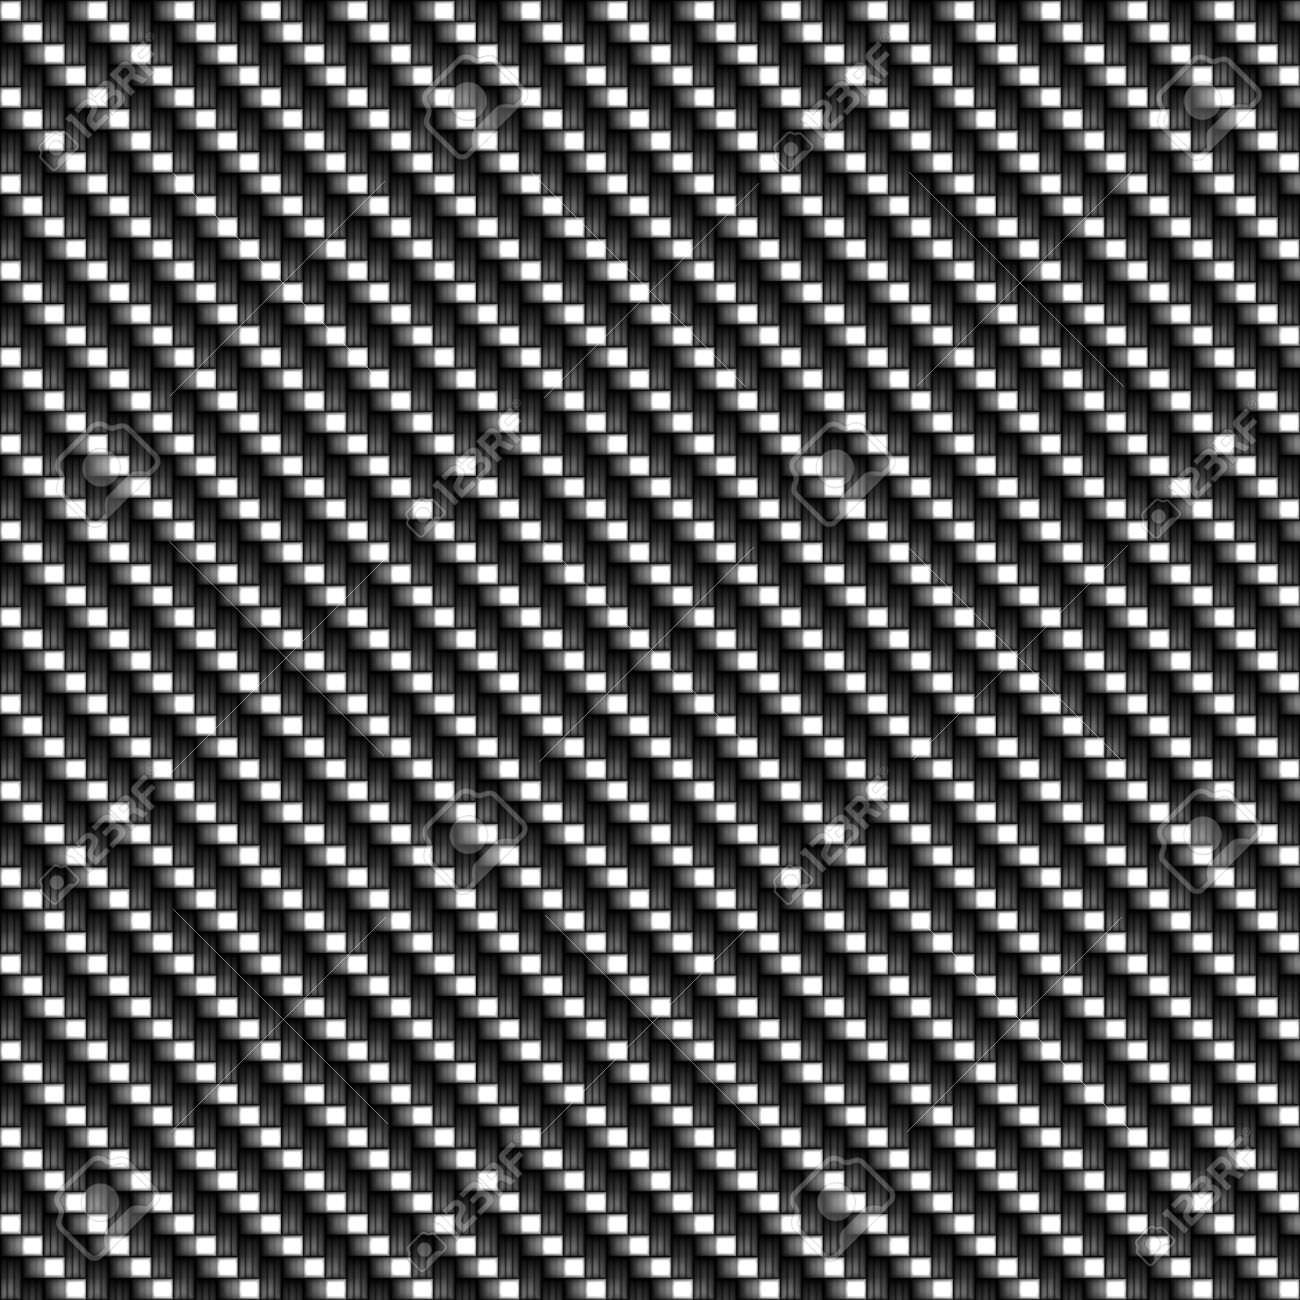 realisti carbon fibertexture